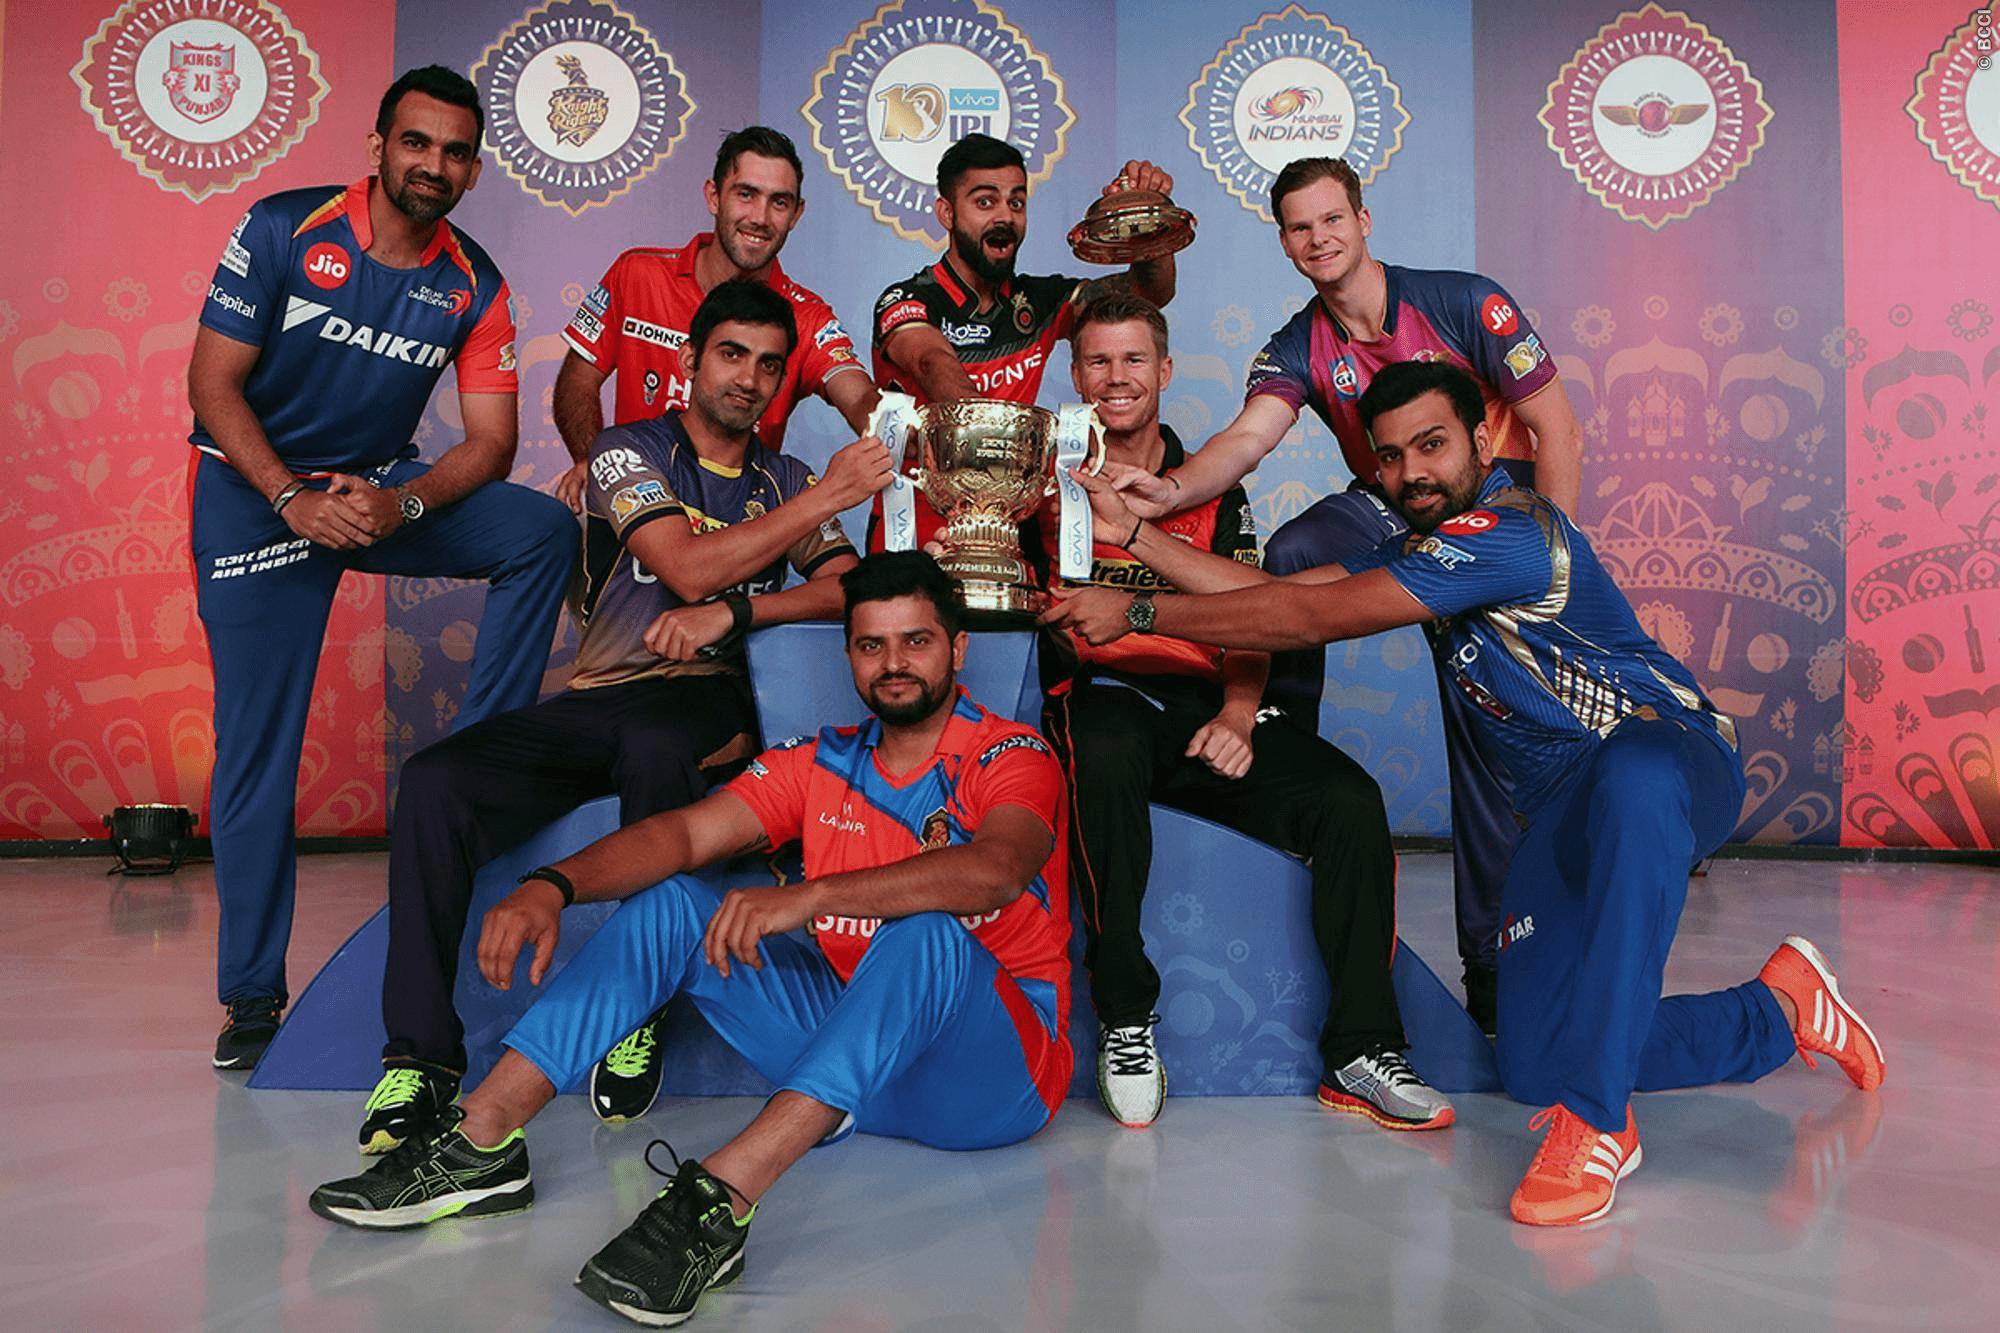 IPL tournament, Indian Premier League, IPL, King's Eleven Punjab, KXIP, Mumbai Indians, MI, Royal Challenger Bangalore, RCB, Rising Pune Supergiants, Virat Kohli, Steve Smith, MS Dhoni